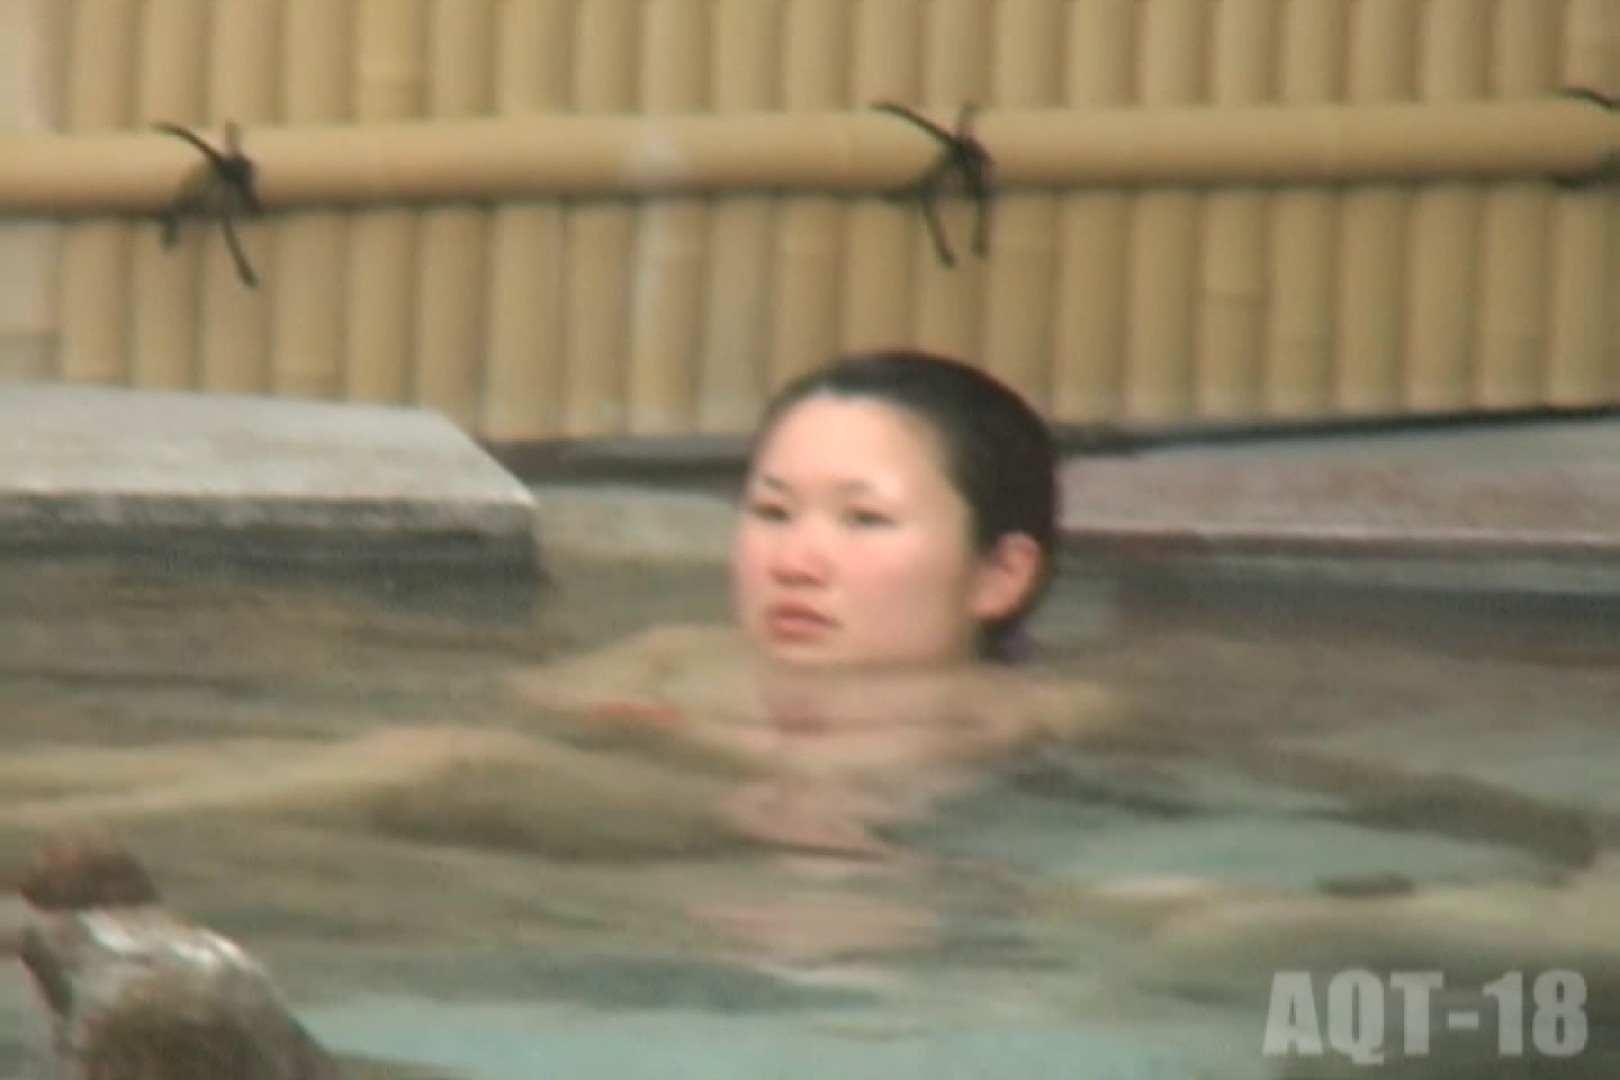 Aquaな露天風呂Vol.864 盗撮 のぞき動画画像 68画像 20